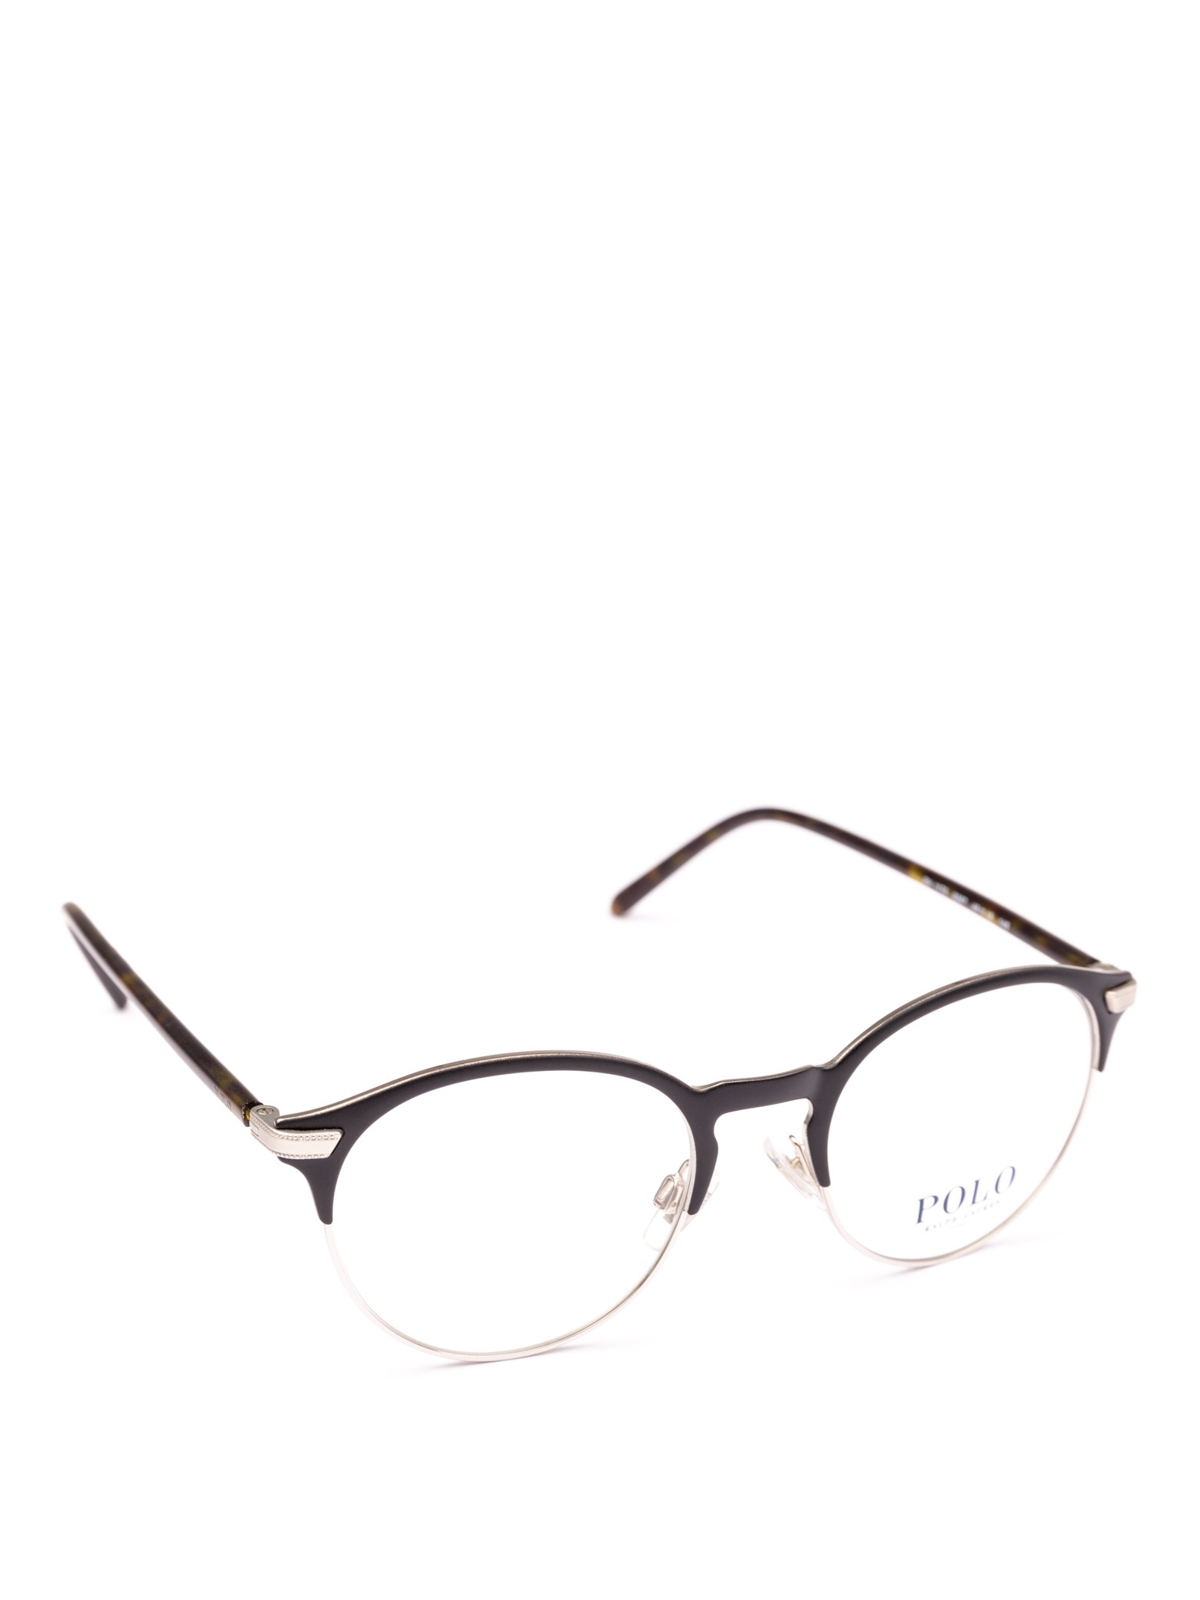 And Black Ralph Metal Framed Polo Lauren Glasses Acetate Half fbyYg7v6